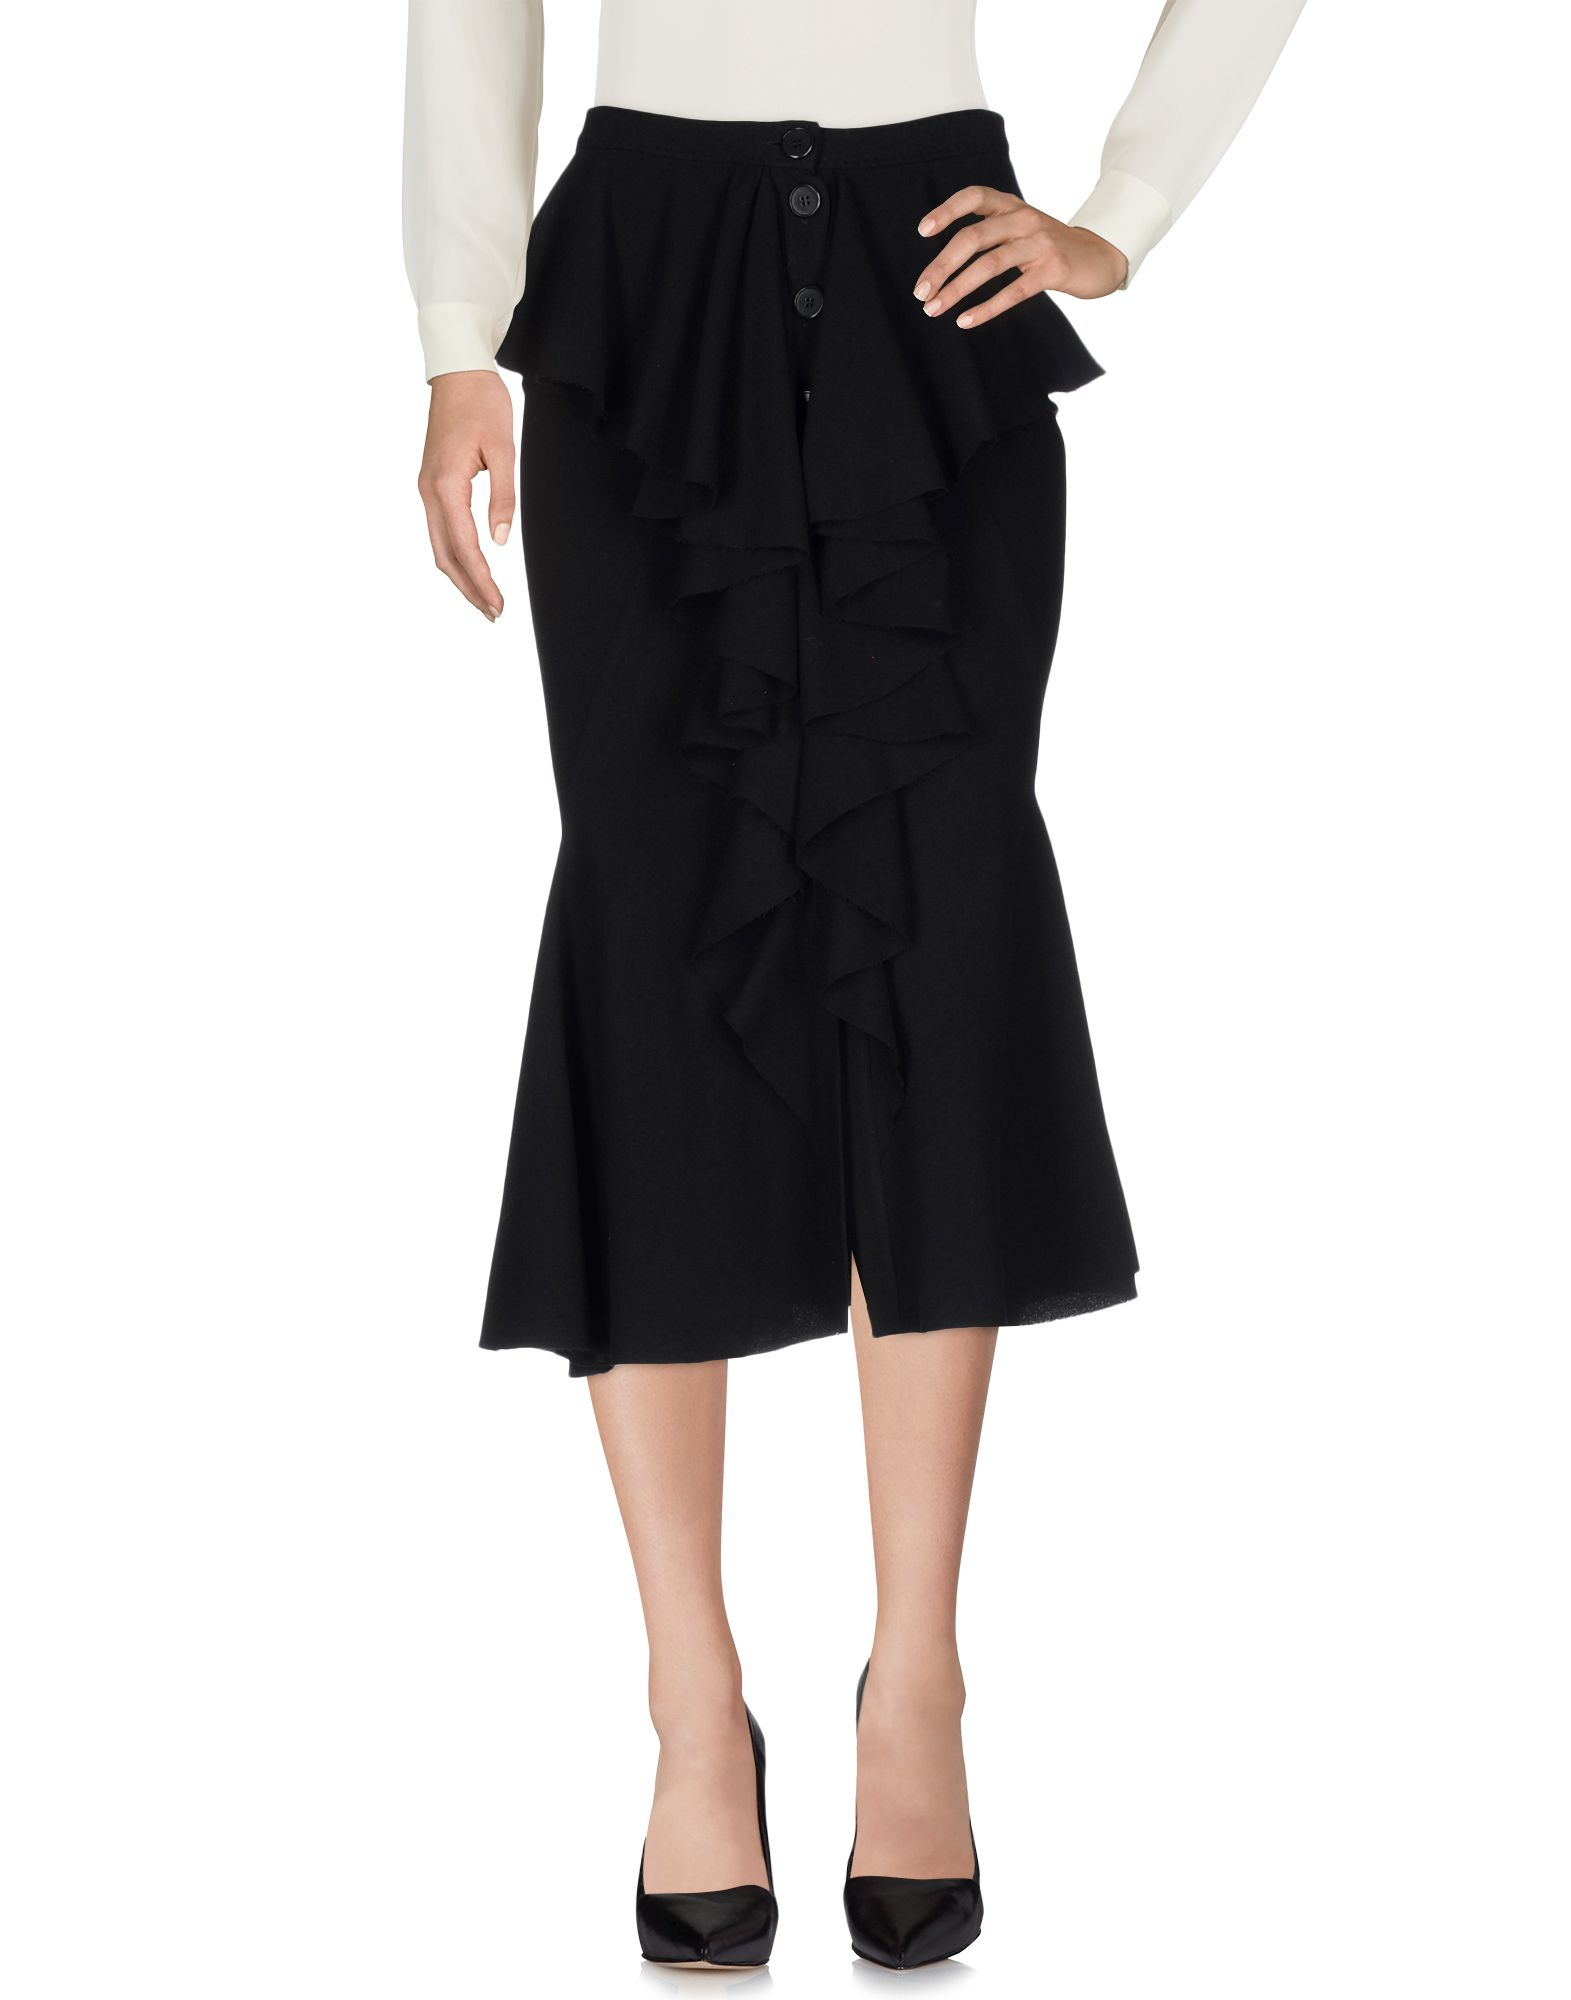 Gonna Longuette Givenchy Donna - Acquista online su pYHt1